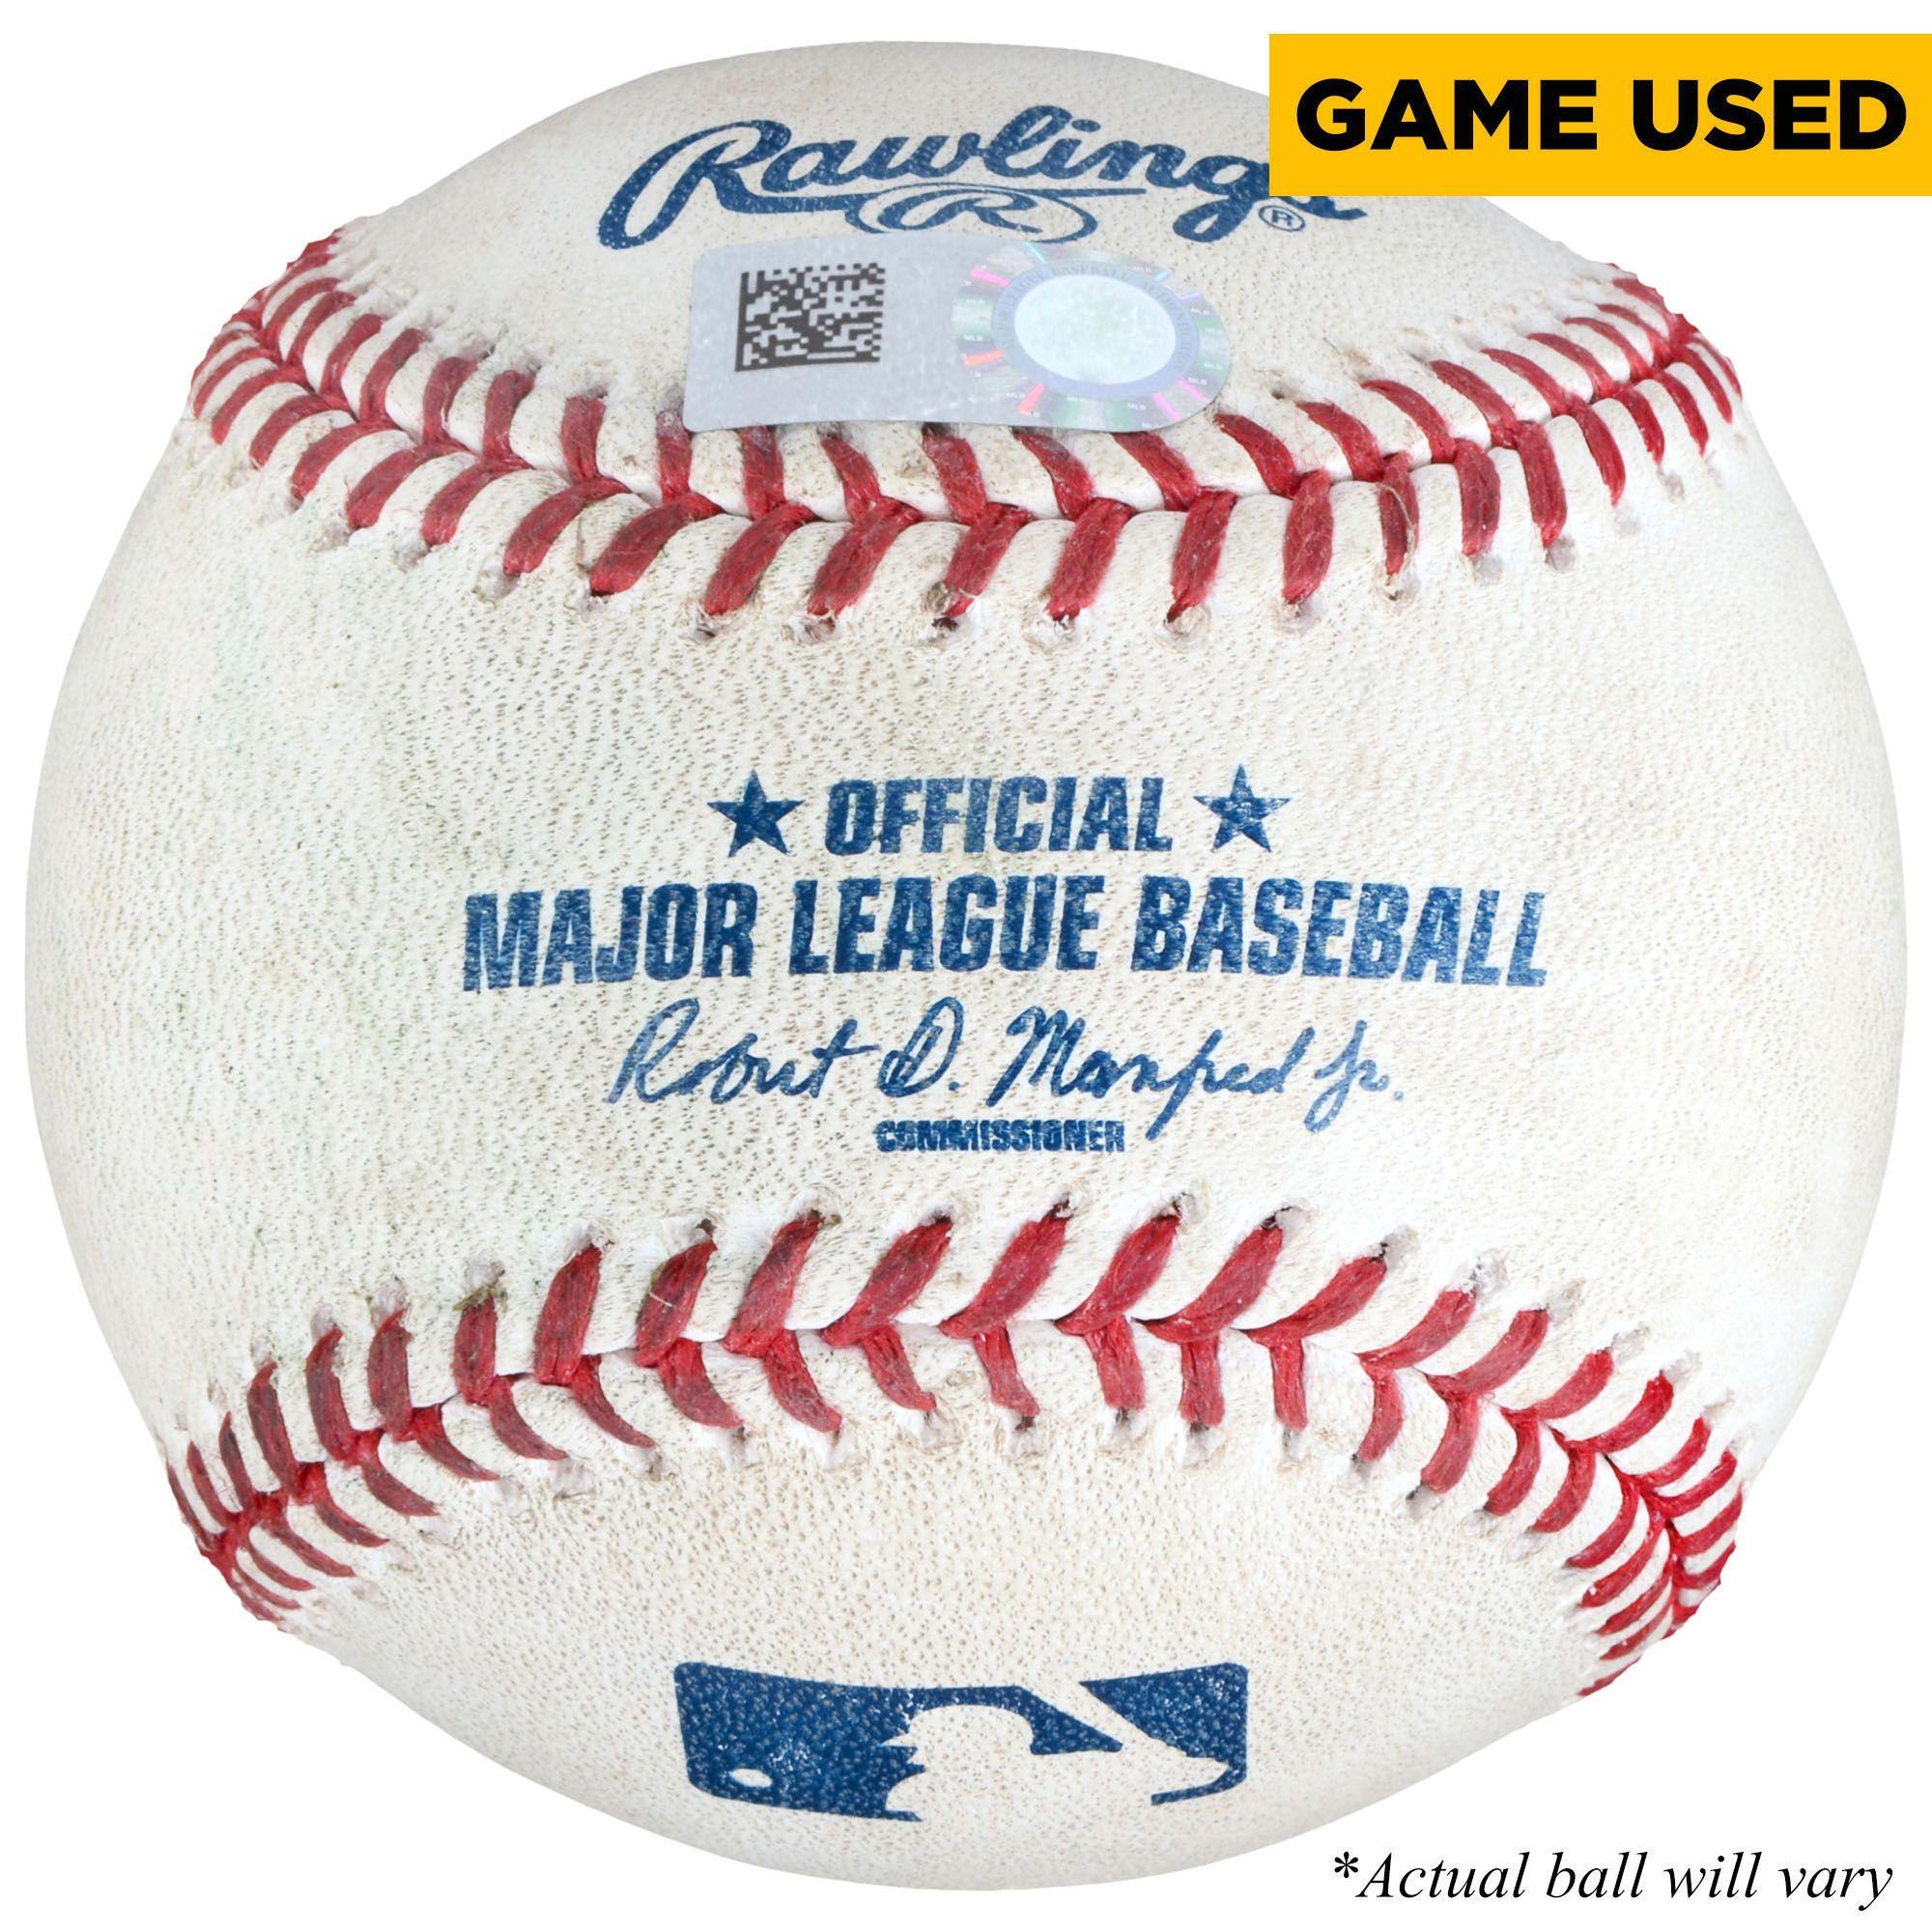 Mlb James Shields San Diego Padres Fanatics Authentic Game Used Strikeout Baseball Vs Arizona Diamondbac Boston Red Sox Game Rangers Baseball Oakland Athletics